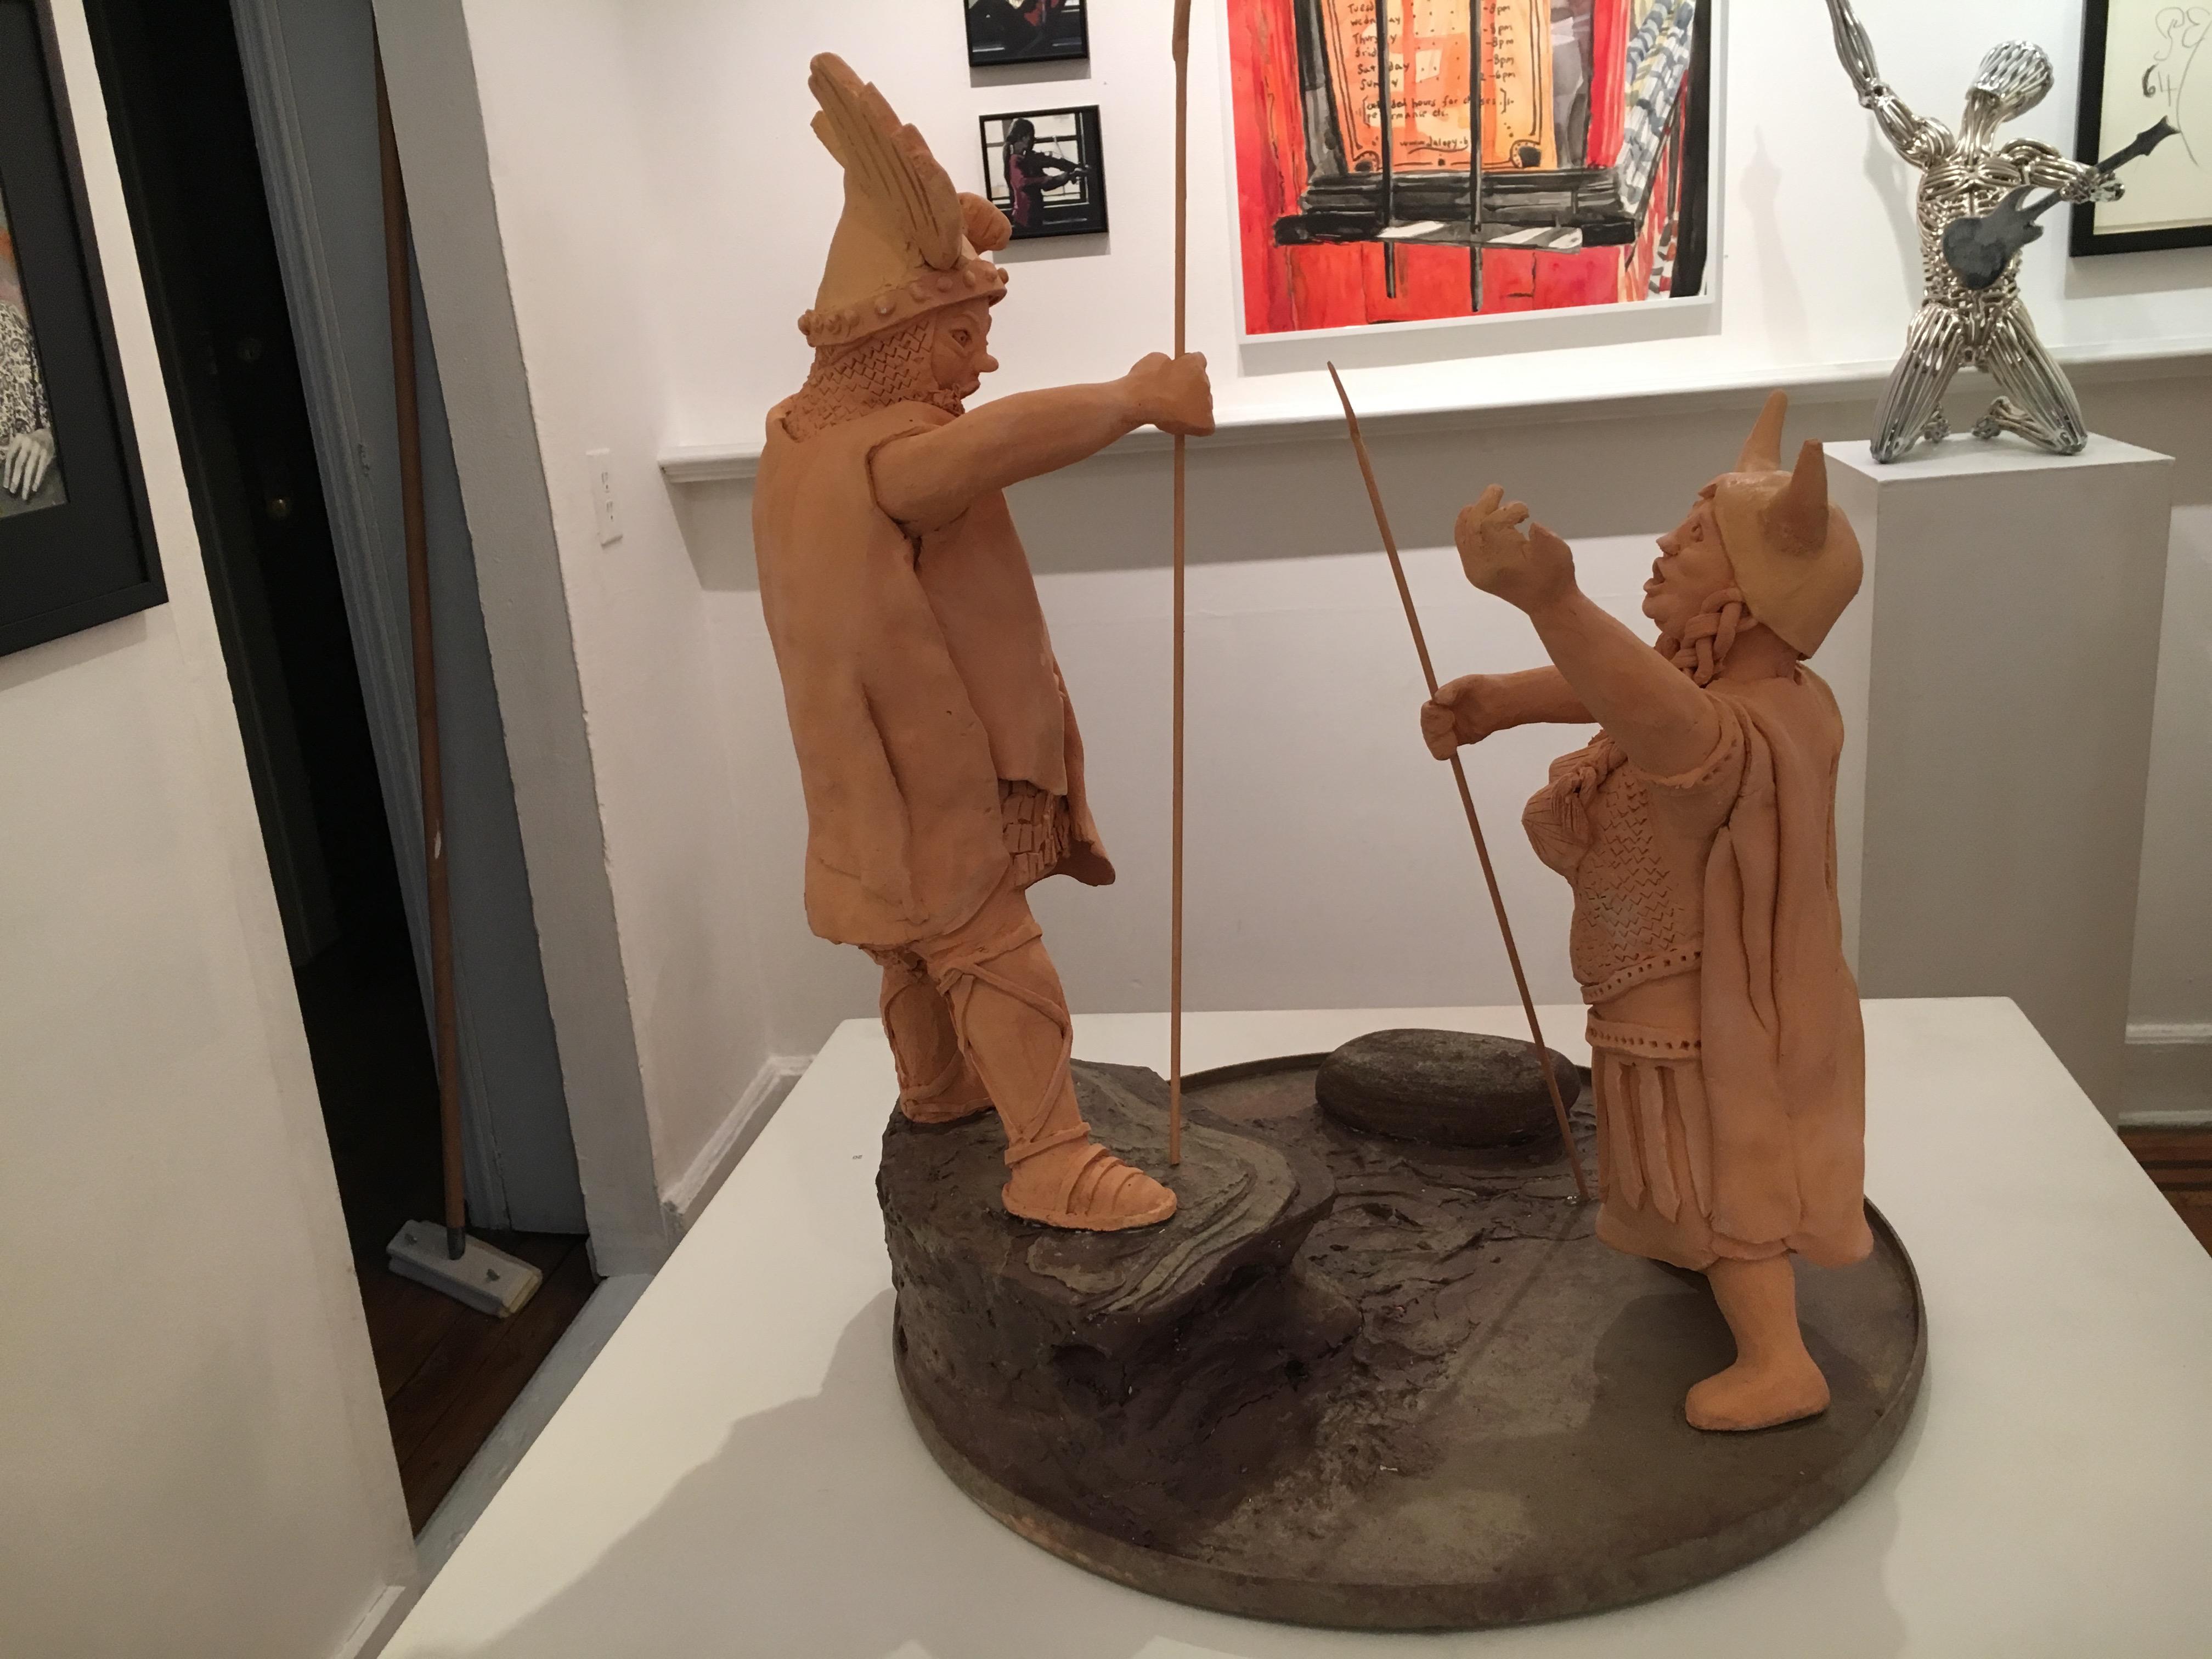 Wotan and Brunnhilde